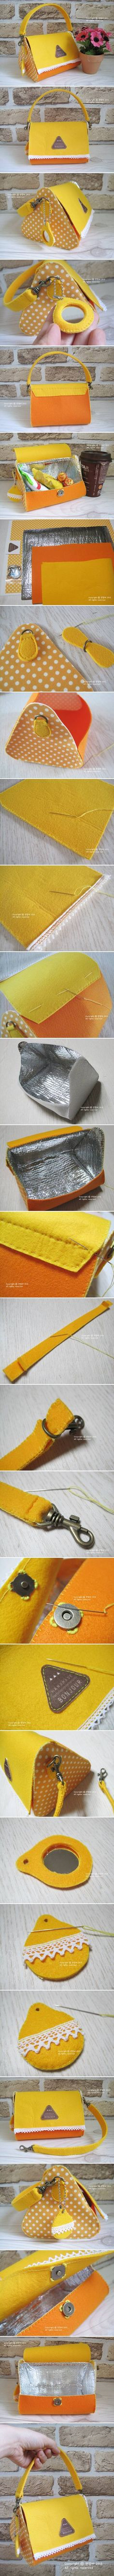 best iyi fikir images on pinterest bricolage handarbeit and